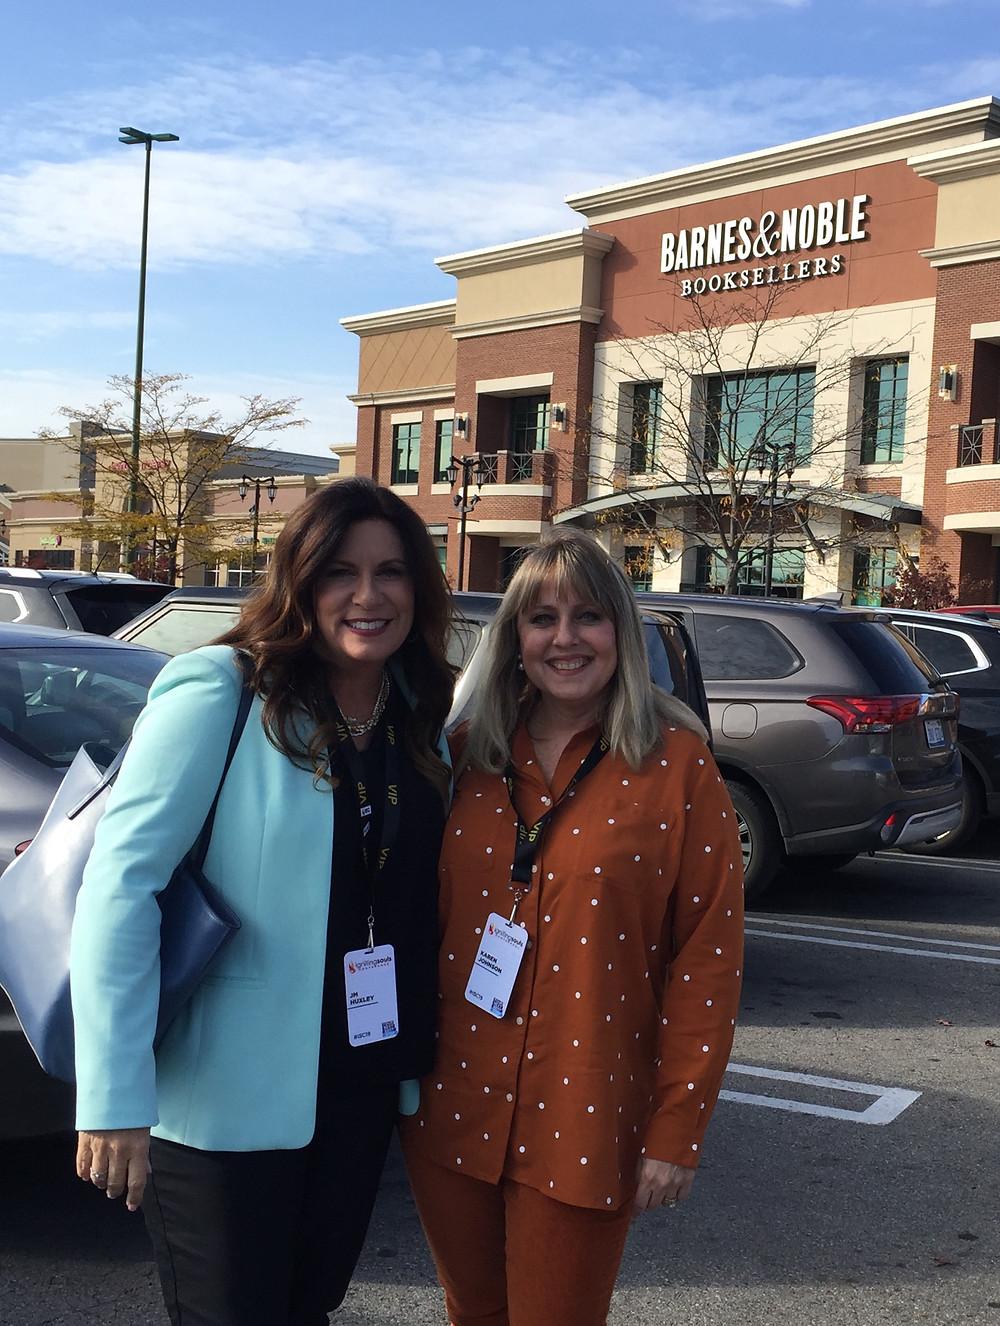 Kansas City Authors J. M. Huxley and Karen Johnson at Book Signing in Columbus, Ohio, October 2019